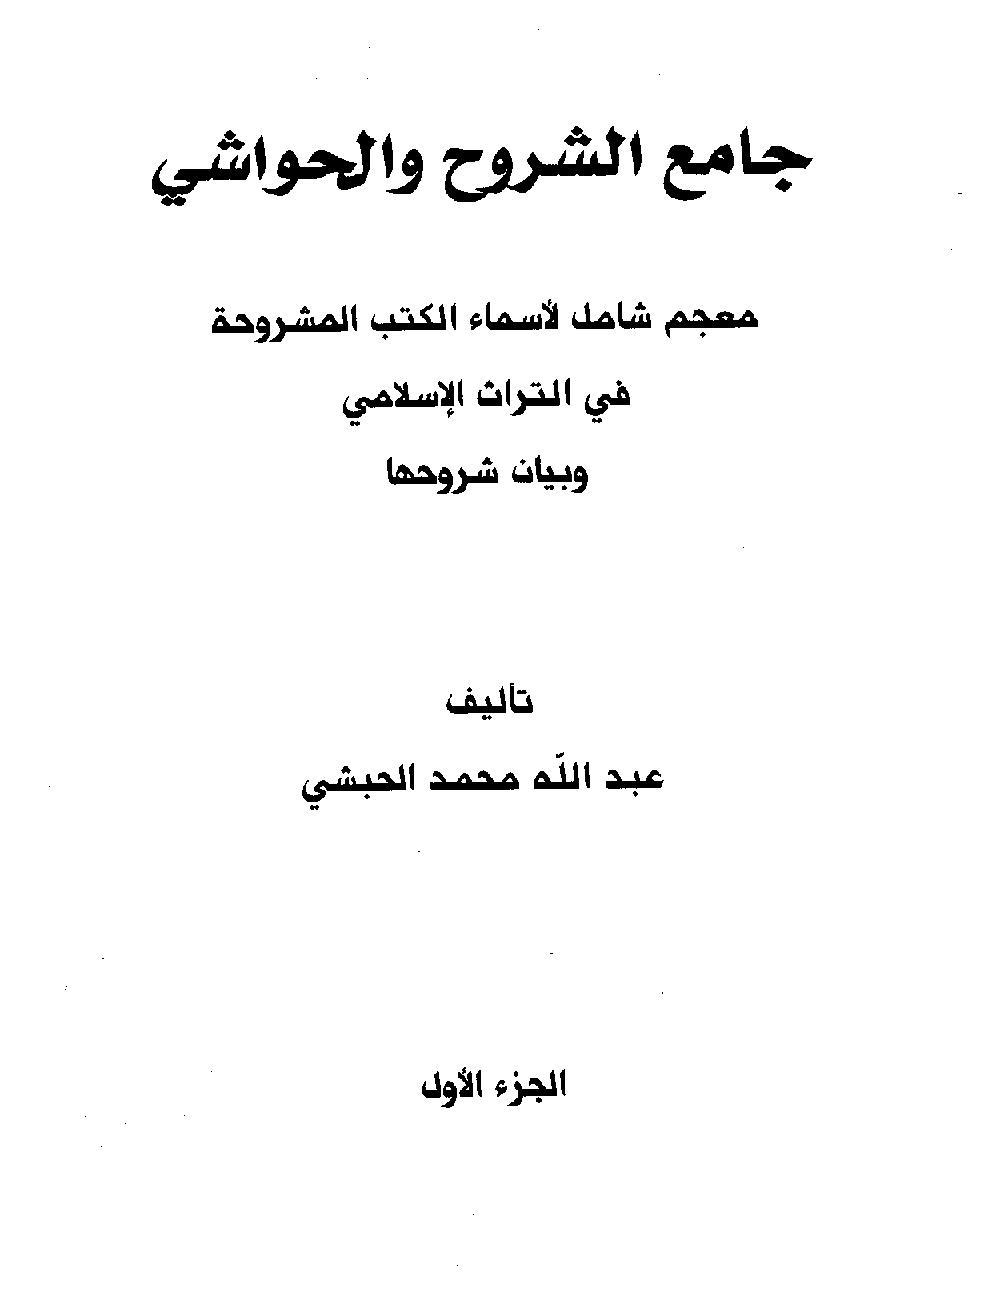 Jami' al-Shuruh